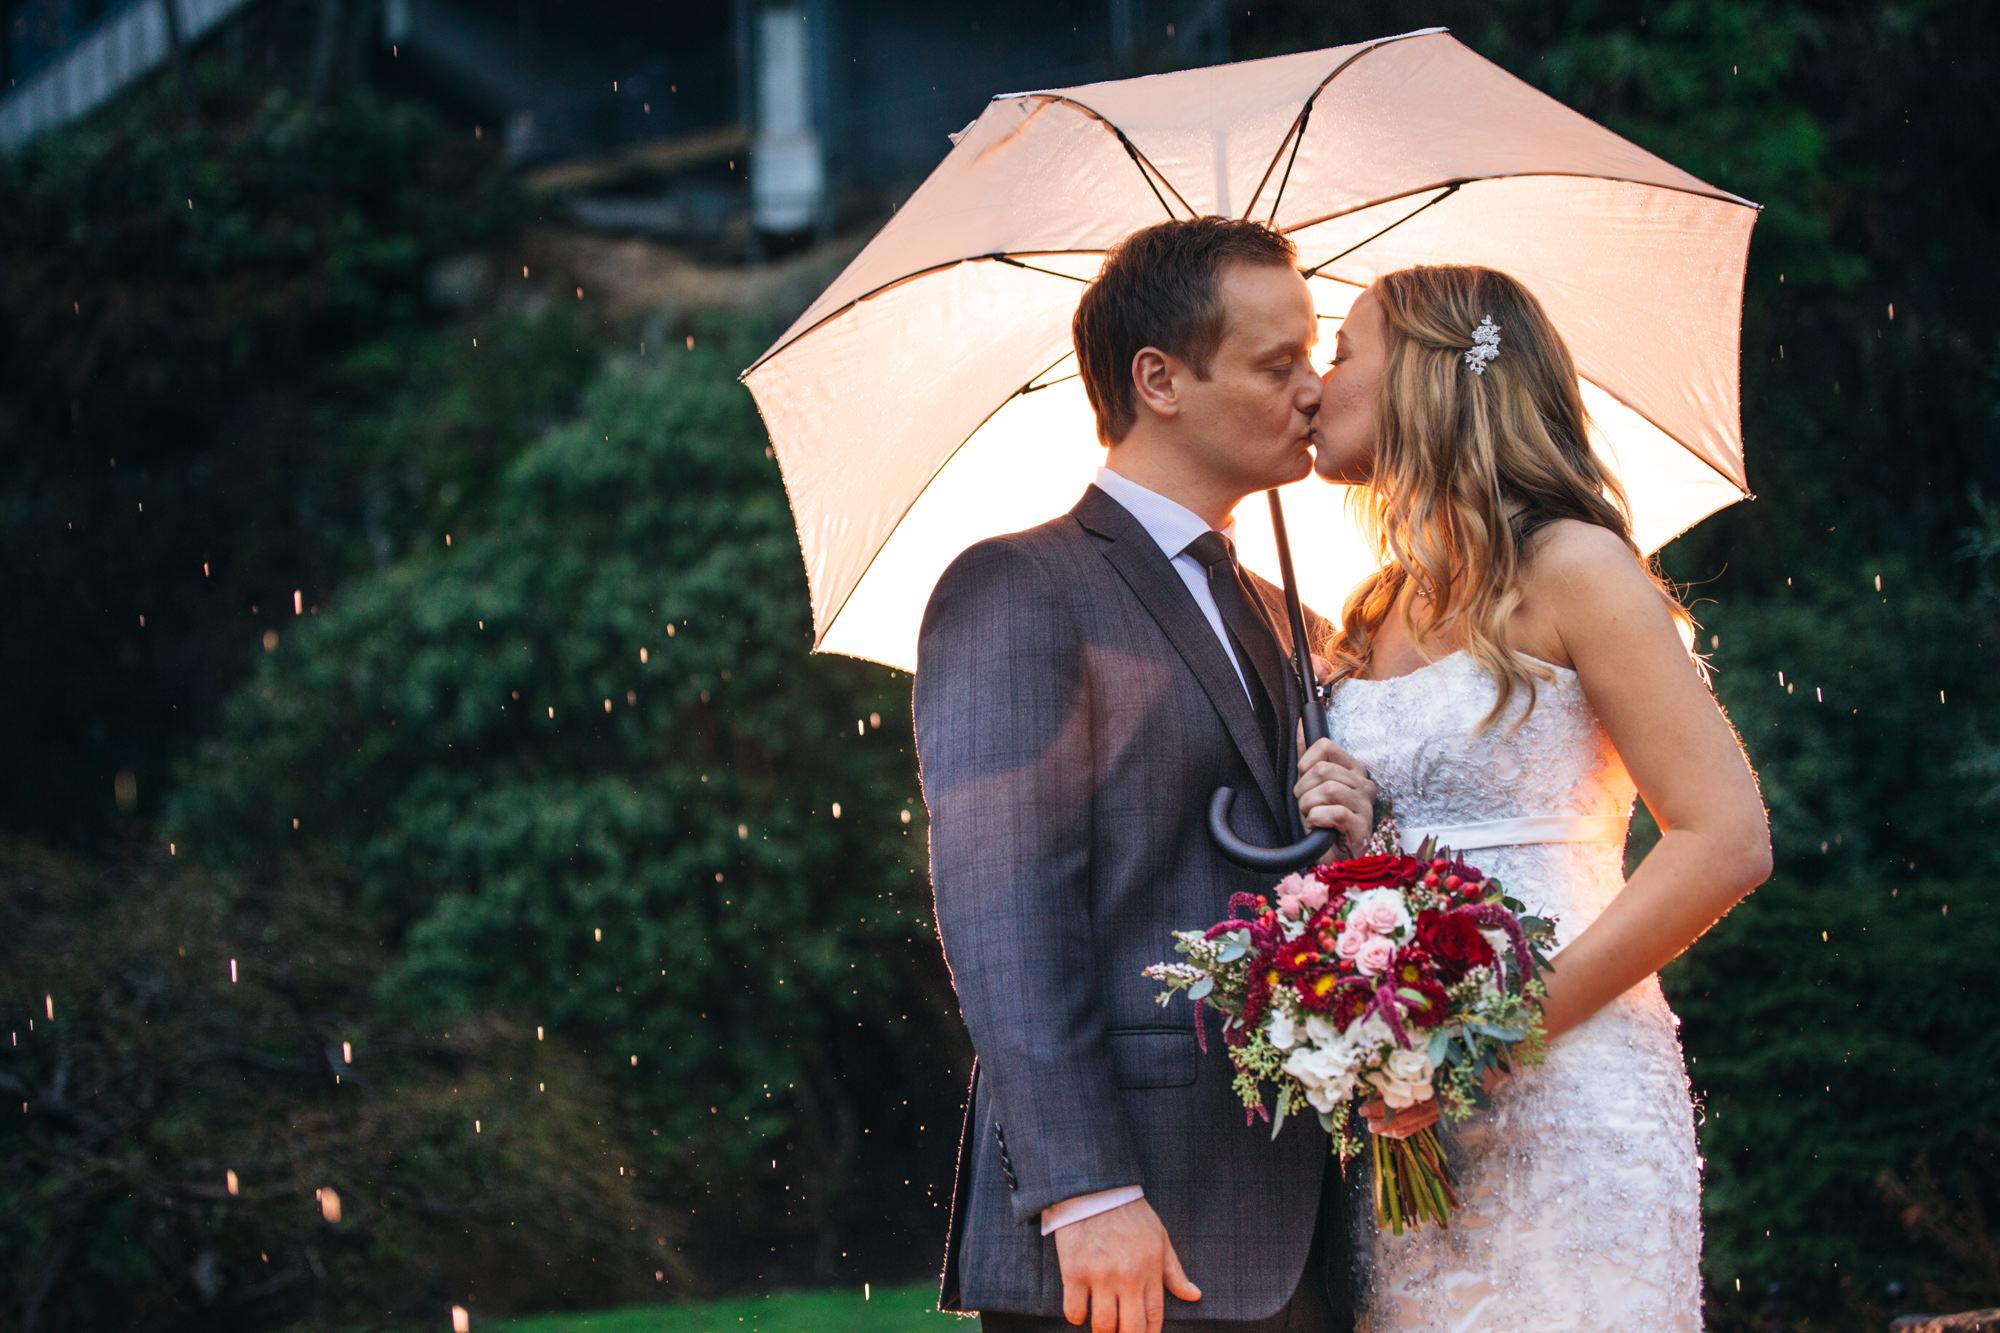 16-queen-elizabeth-park-qepark-bride-groom-umbrella.jpg